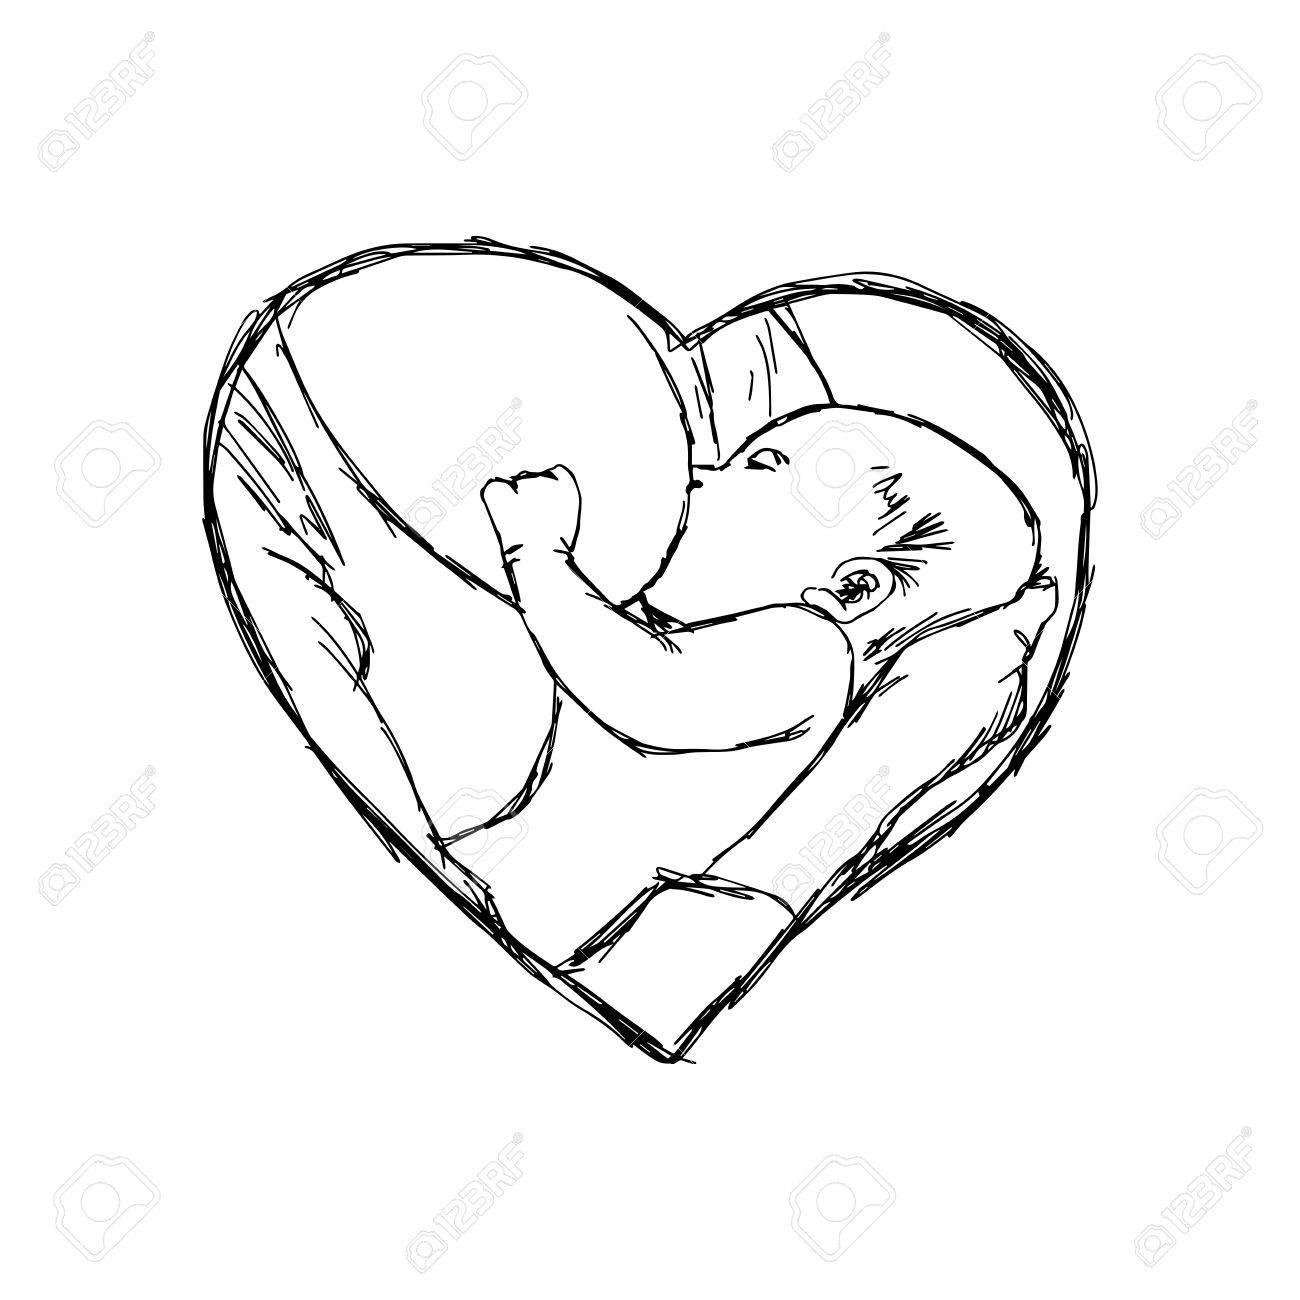 1300x1300 Illustration Doodle Of Sketch Breastfeeding Baby In Heart Shape